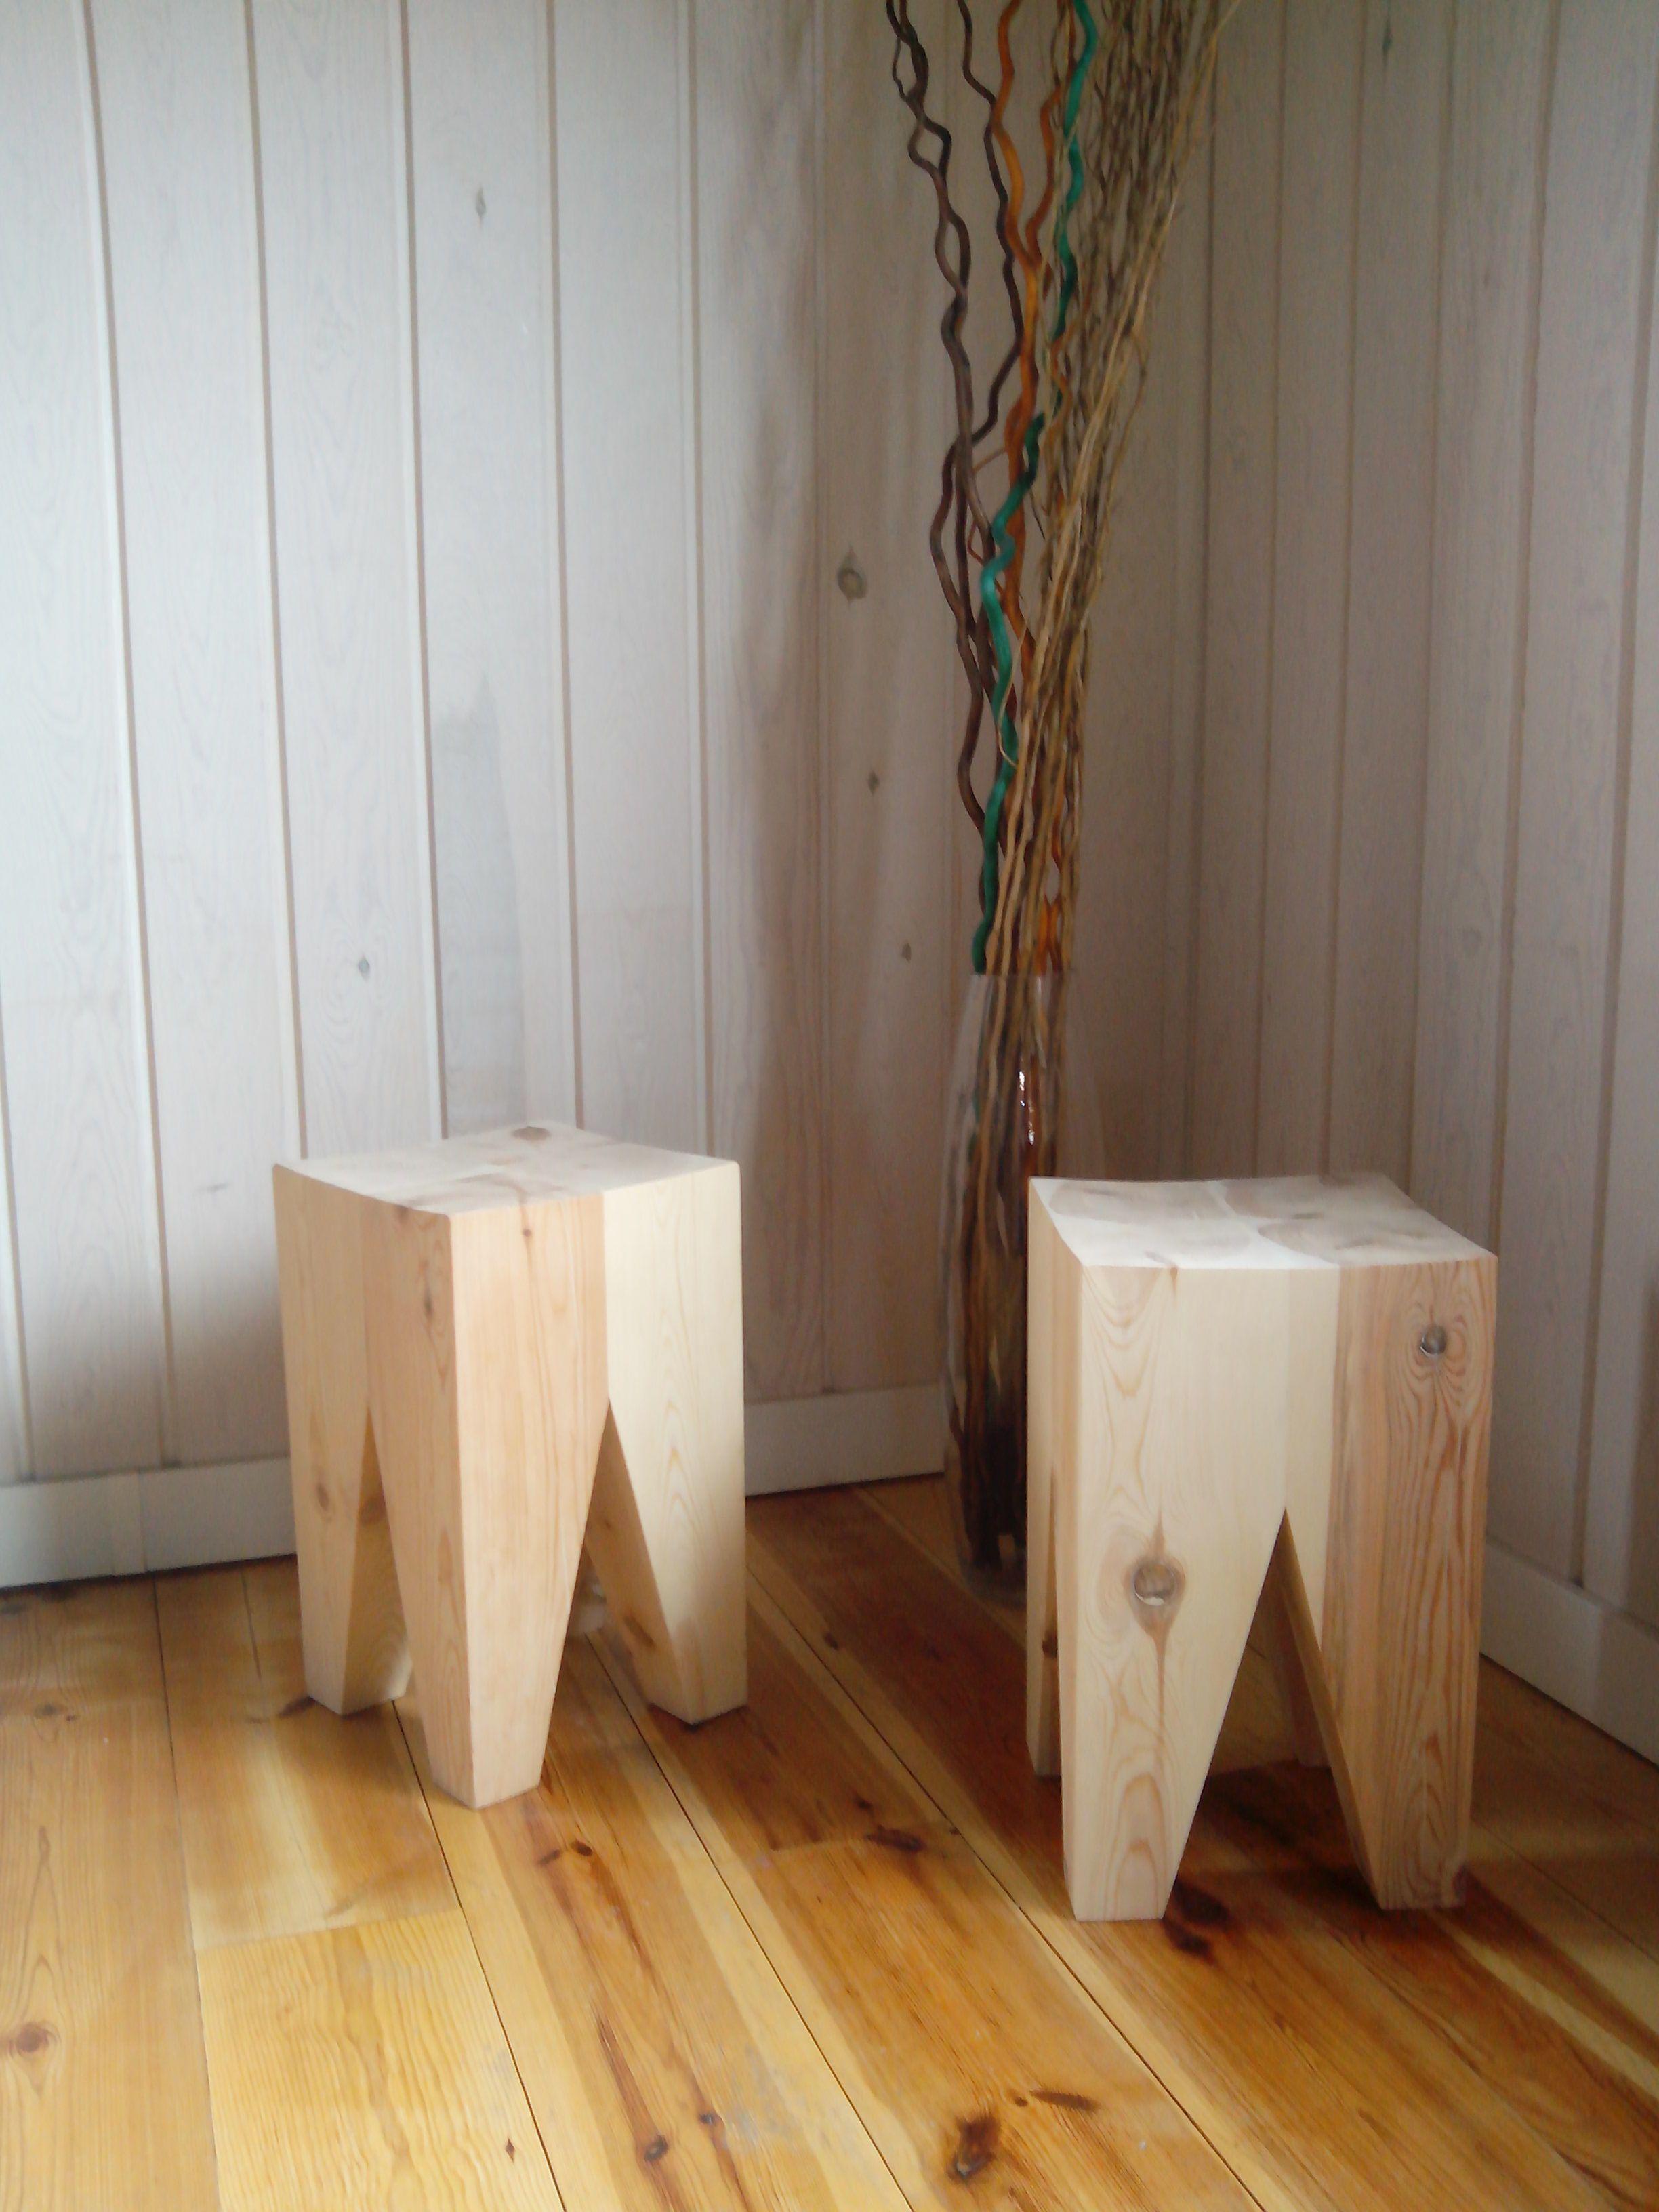 Banqueta MADERAPINOSORIA | Mobiliario con madera... | Pinterest ...